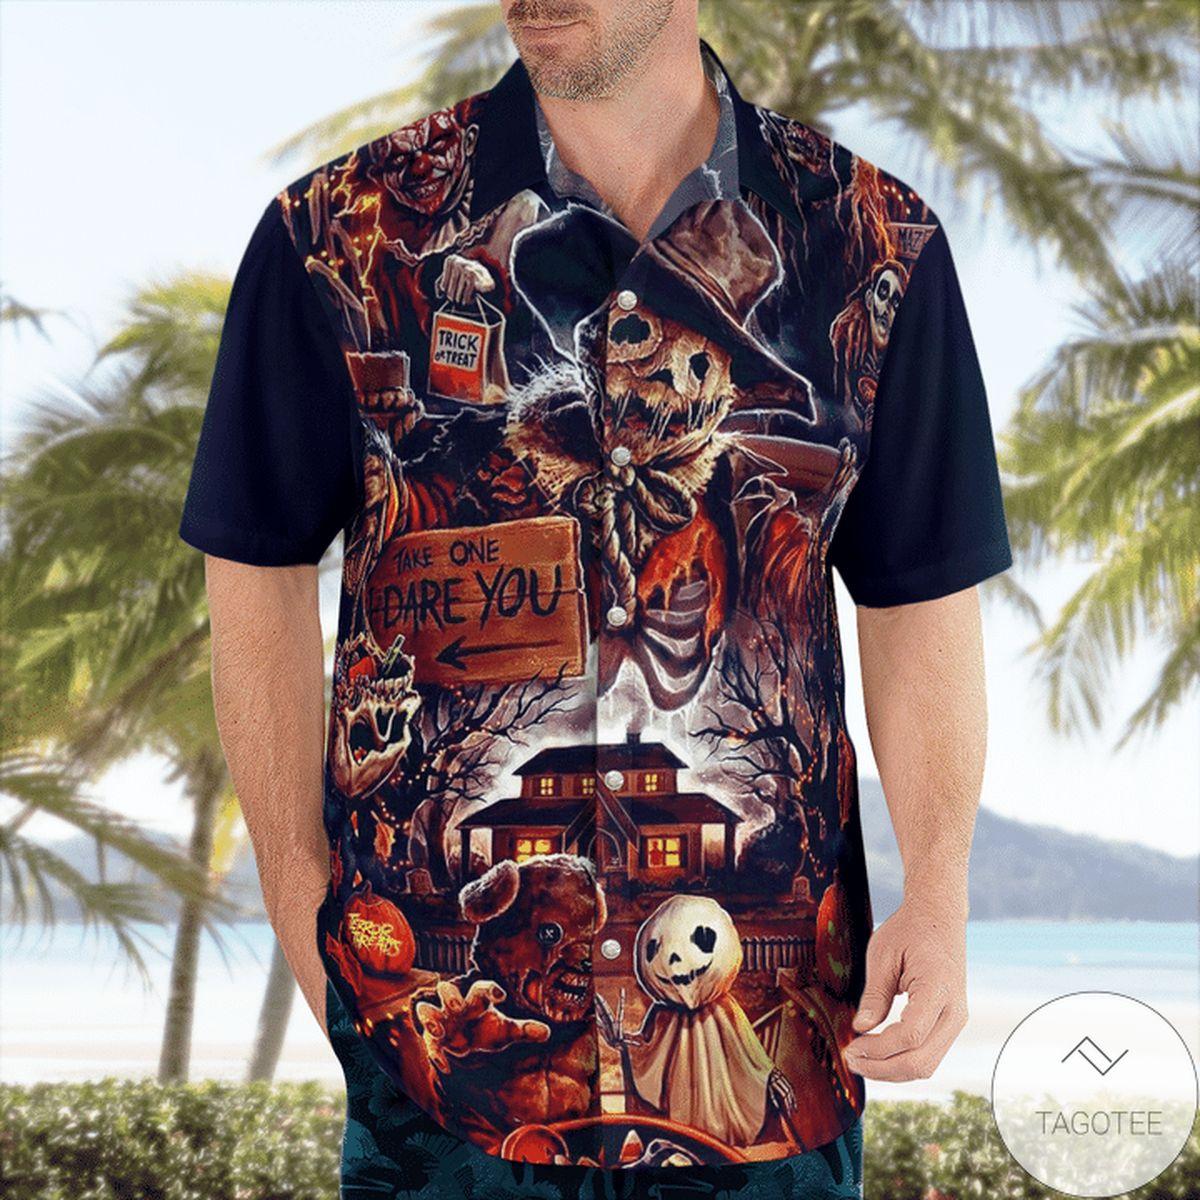 Take One Dare You Halloween Hawaiian Shirt